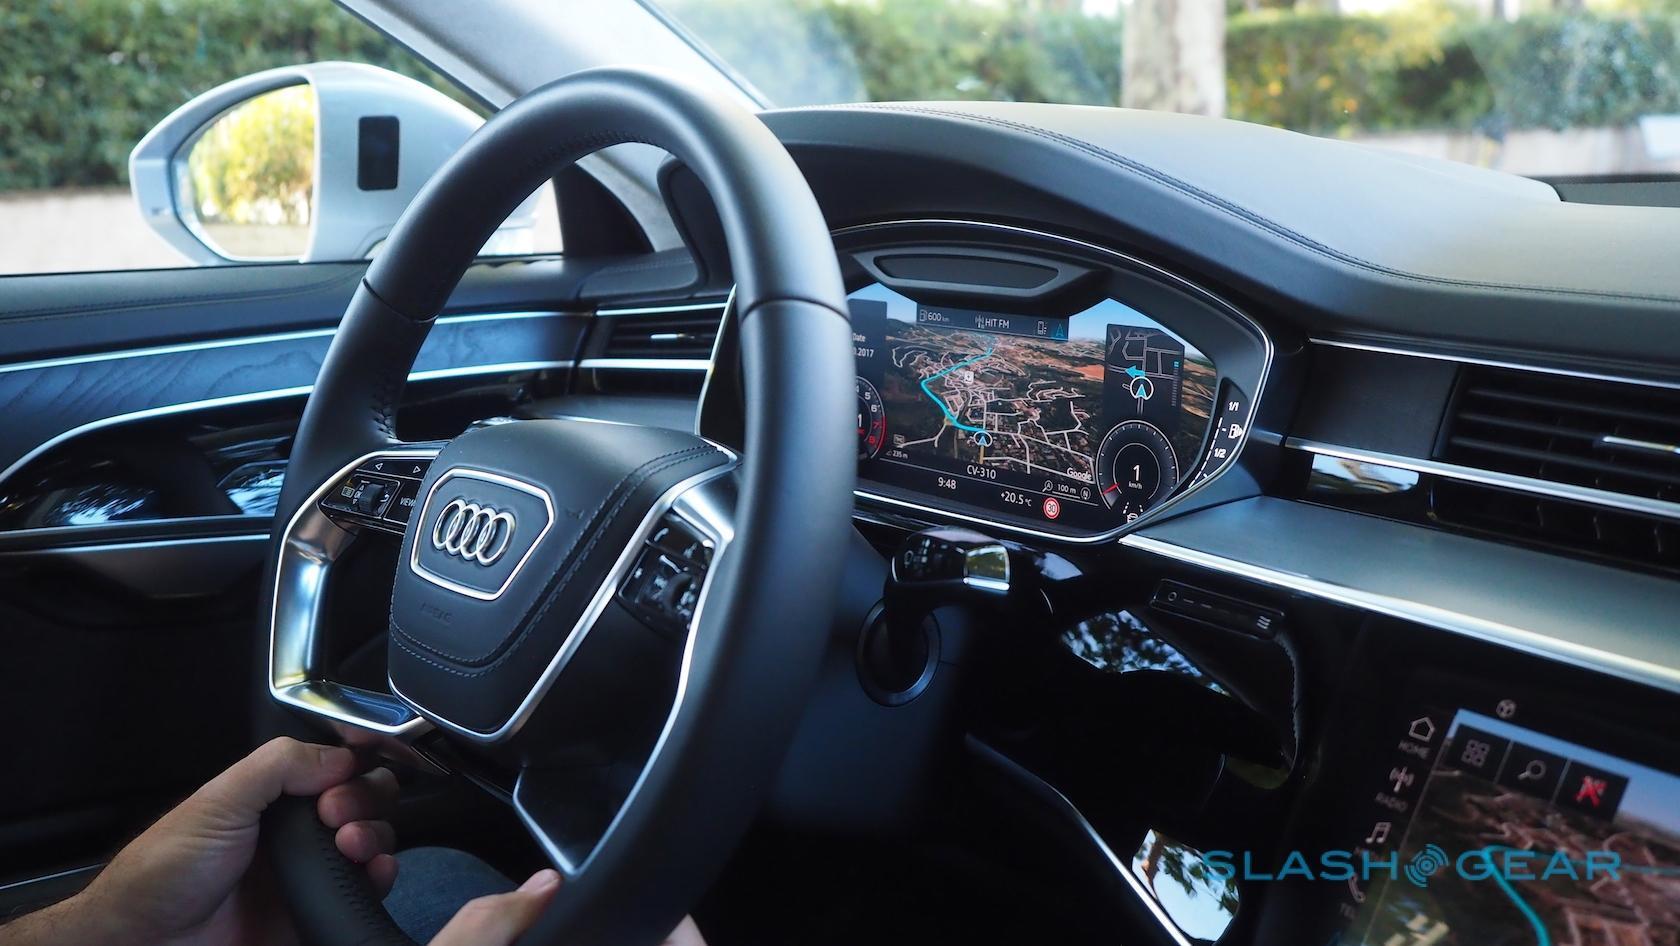 2019 Audi A8 First Drive: The new luxury - SlashGear